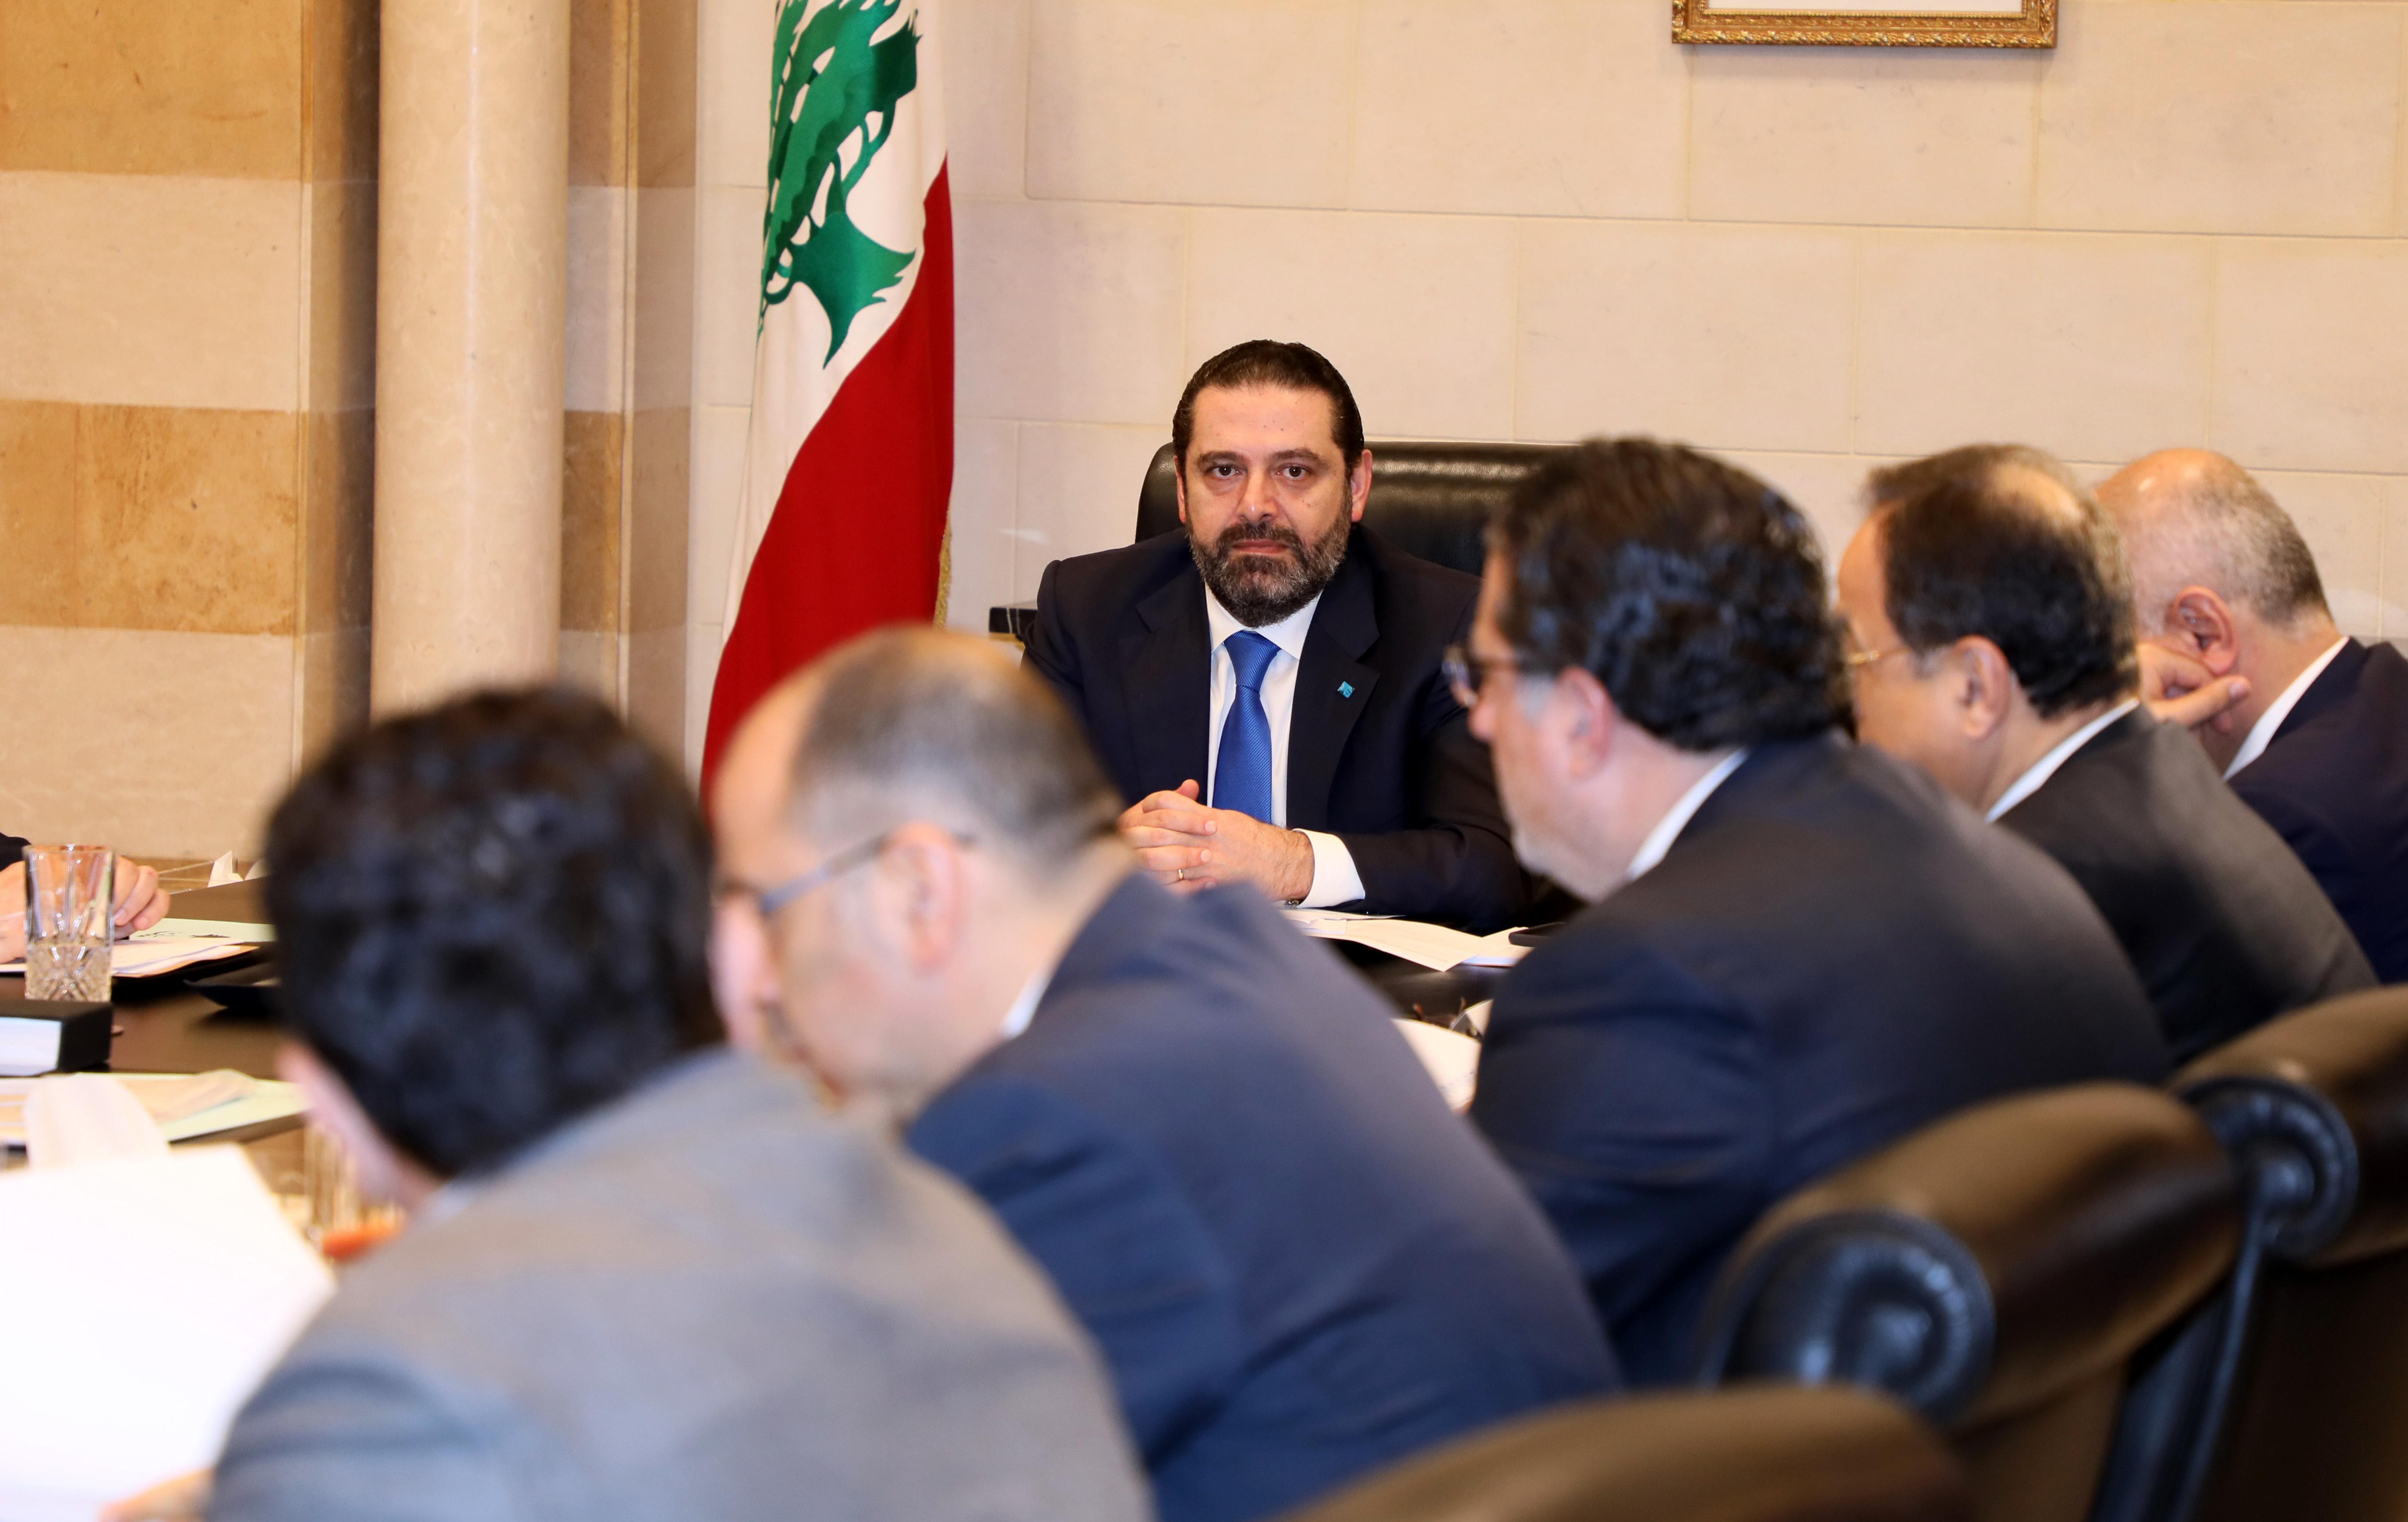 Pr Minister Saad Hariri Heading a Ministerial Council.jpg 1